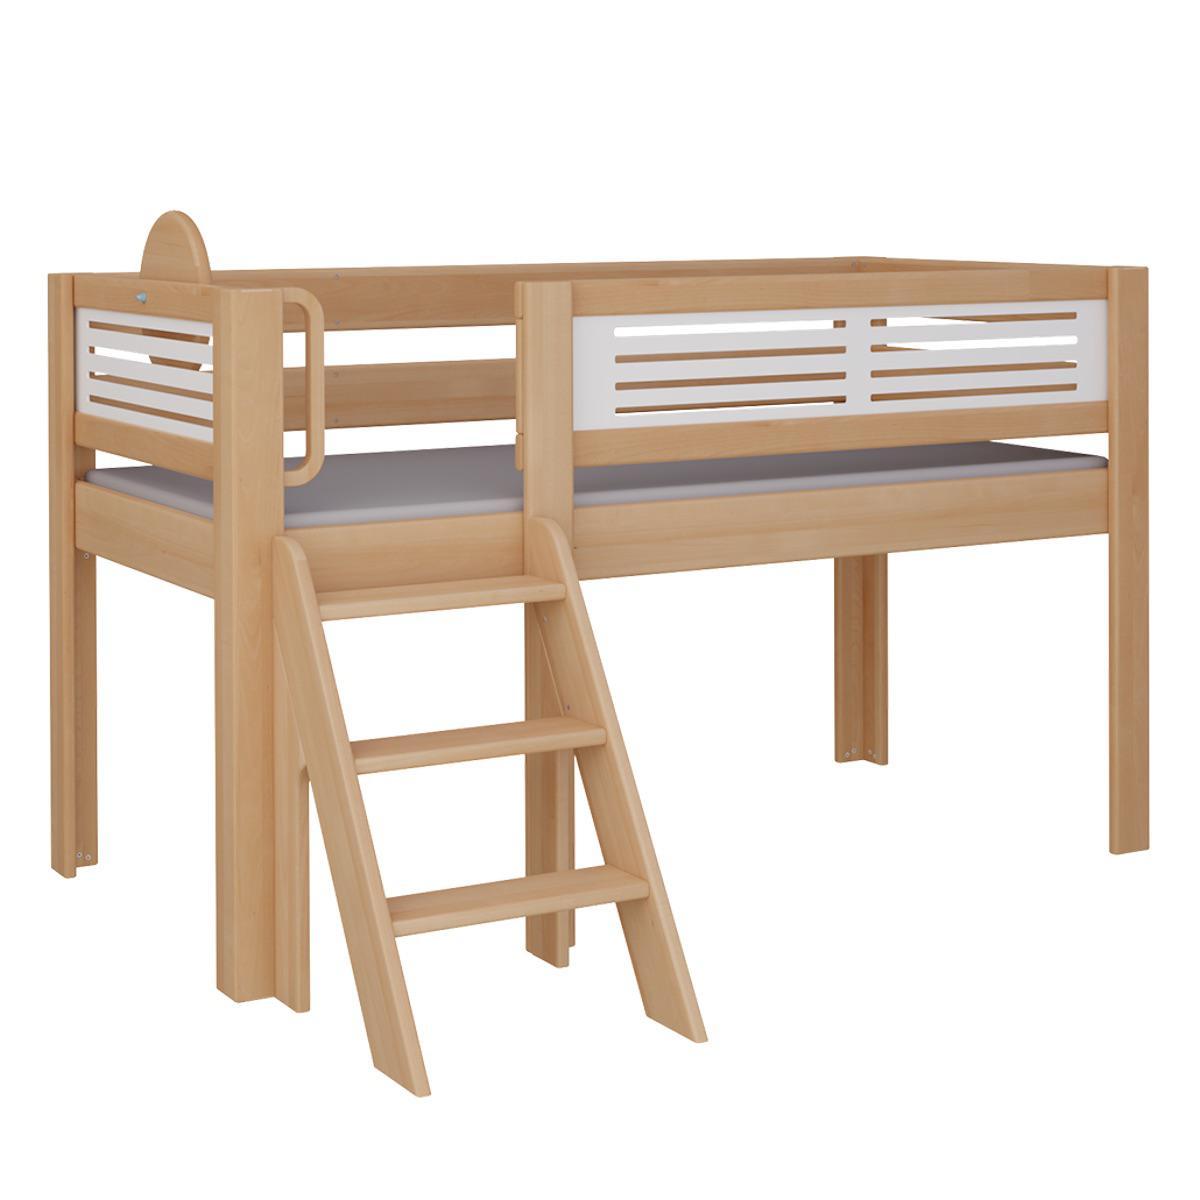 Tatü halbhohes Bett mit Treppe DELUXE De Breuyn natur geölt Füllungen weiß